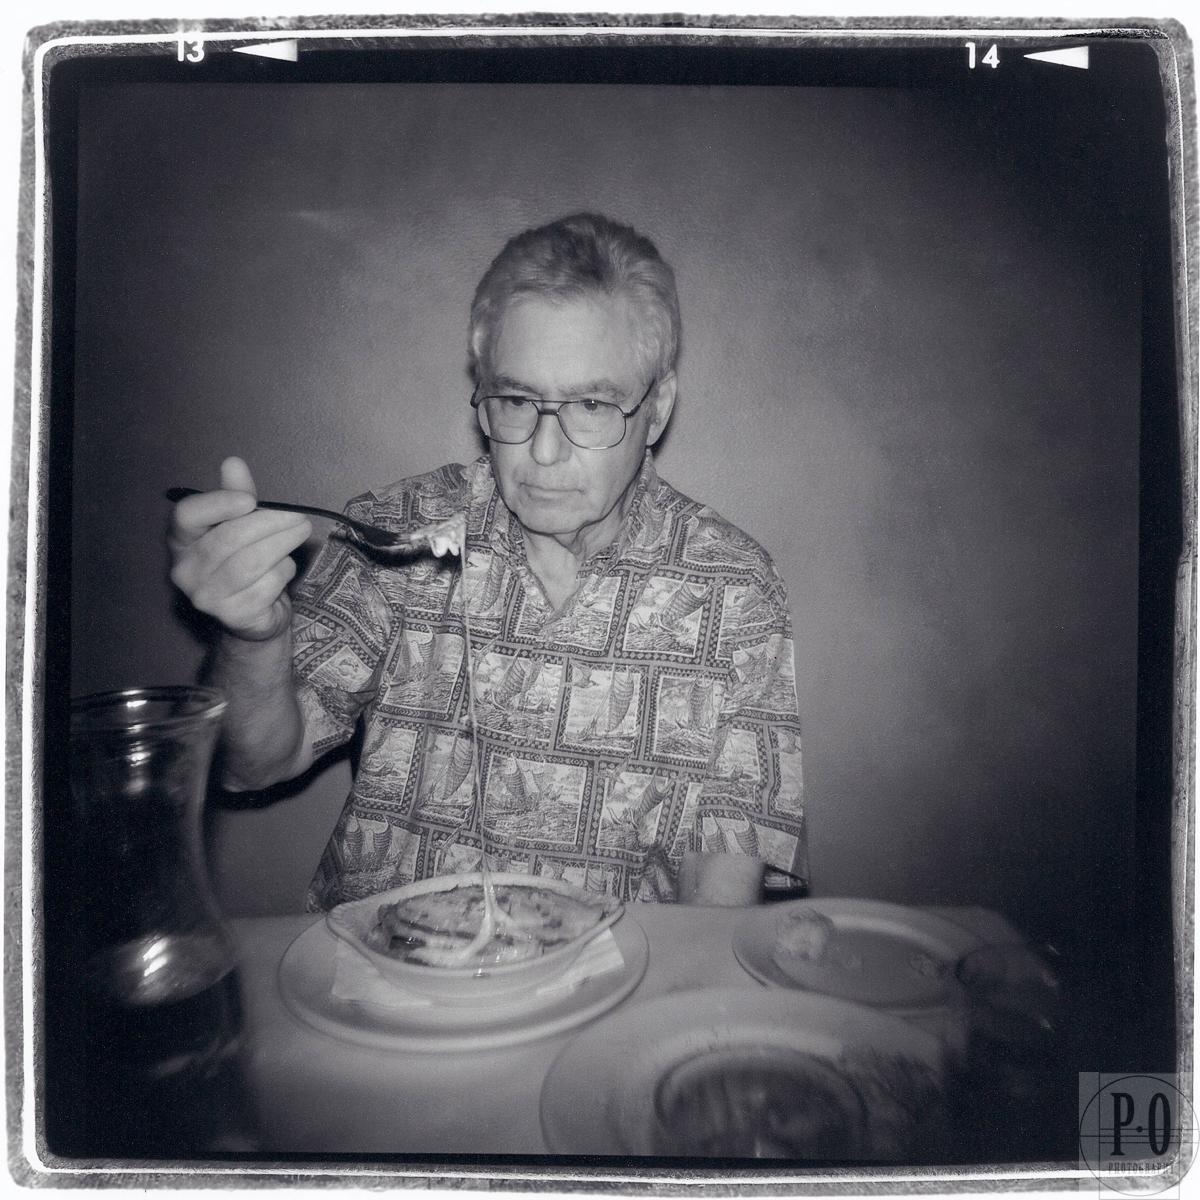 holga film camera portrait